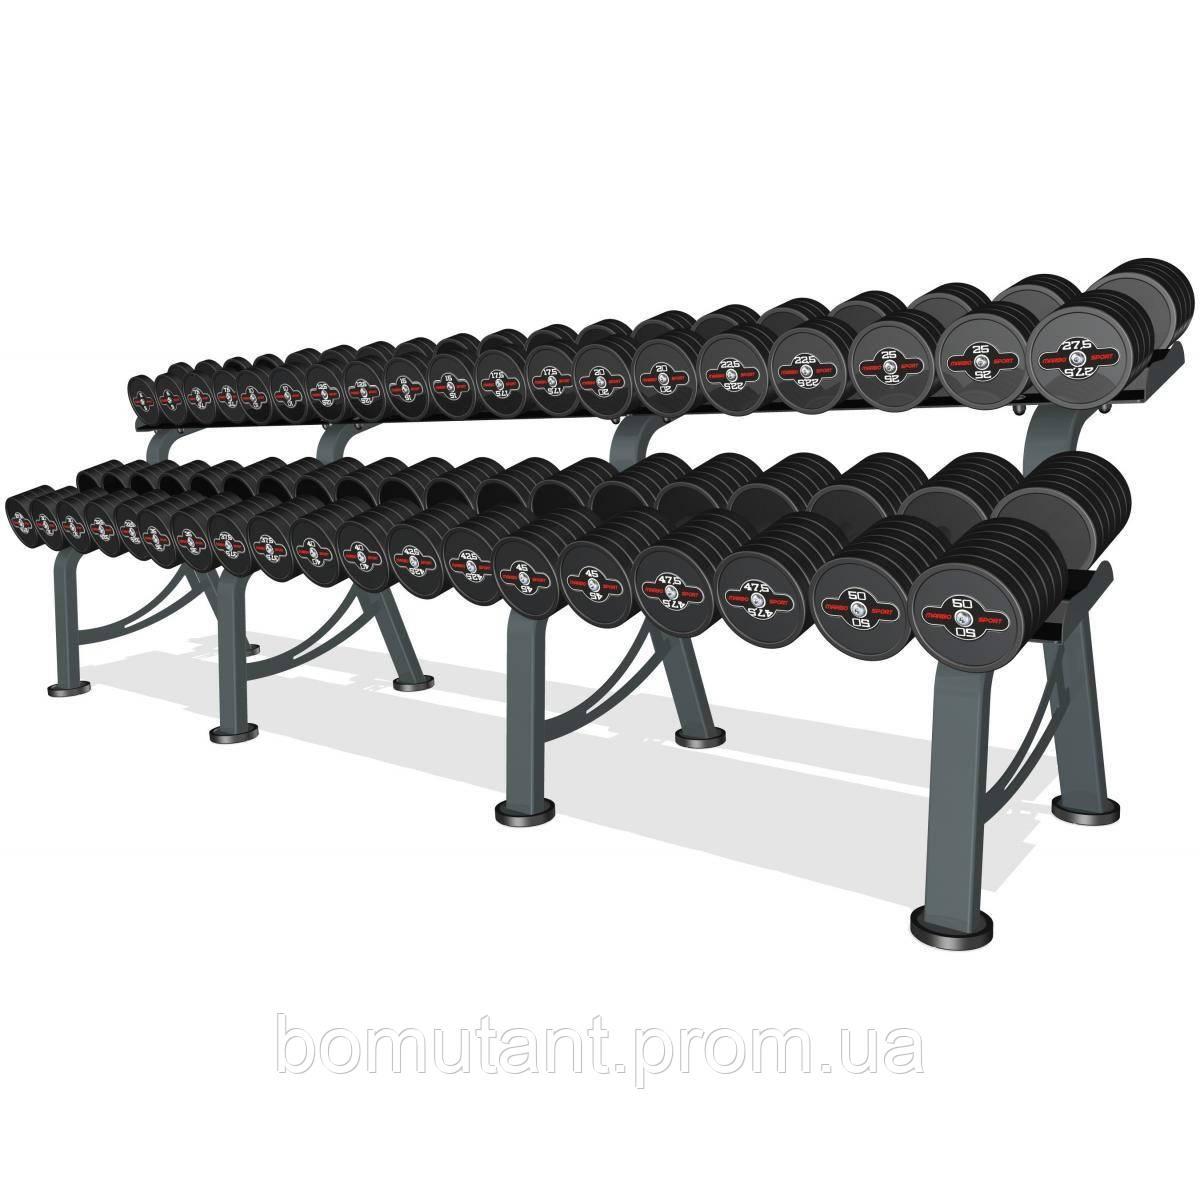 Гантельный ряд Marbo-Sport 5-50 кг.